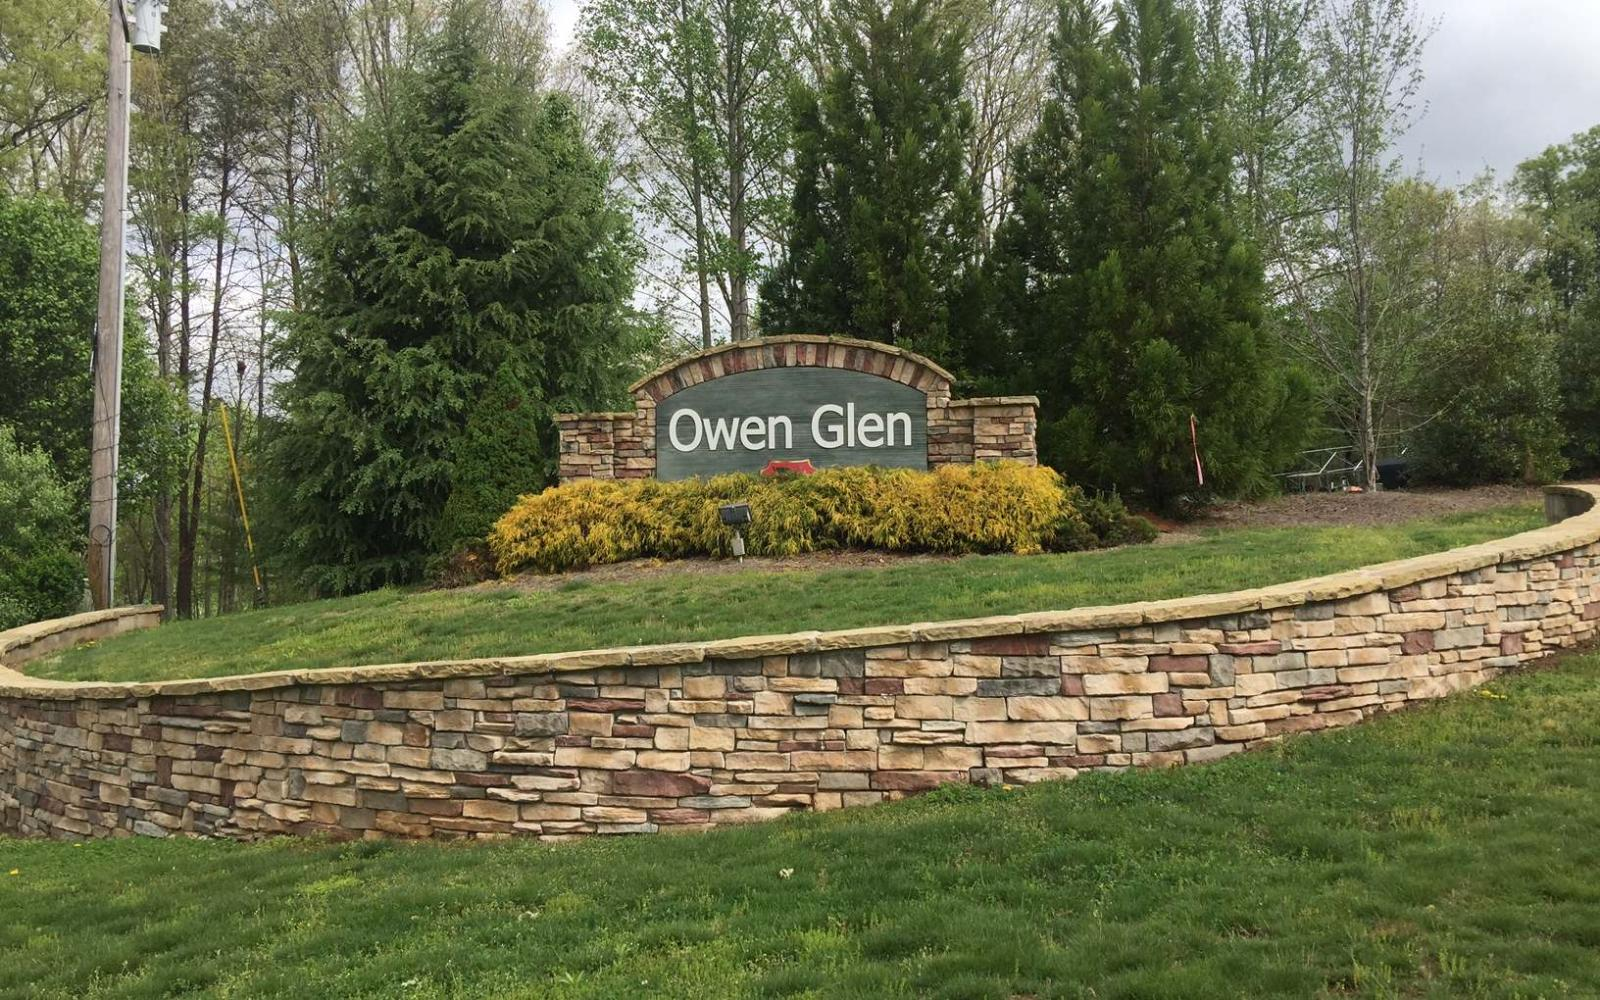 Lt 44 Owen Glen #44, Blairsville, GA 30512 - MLS #279820